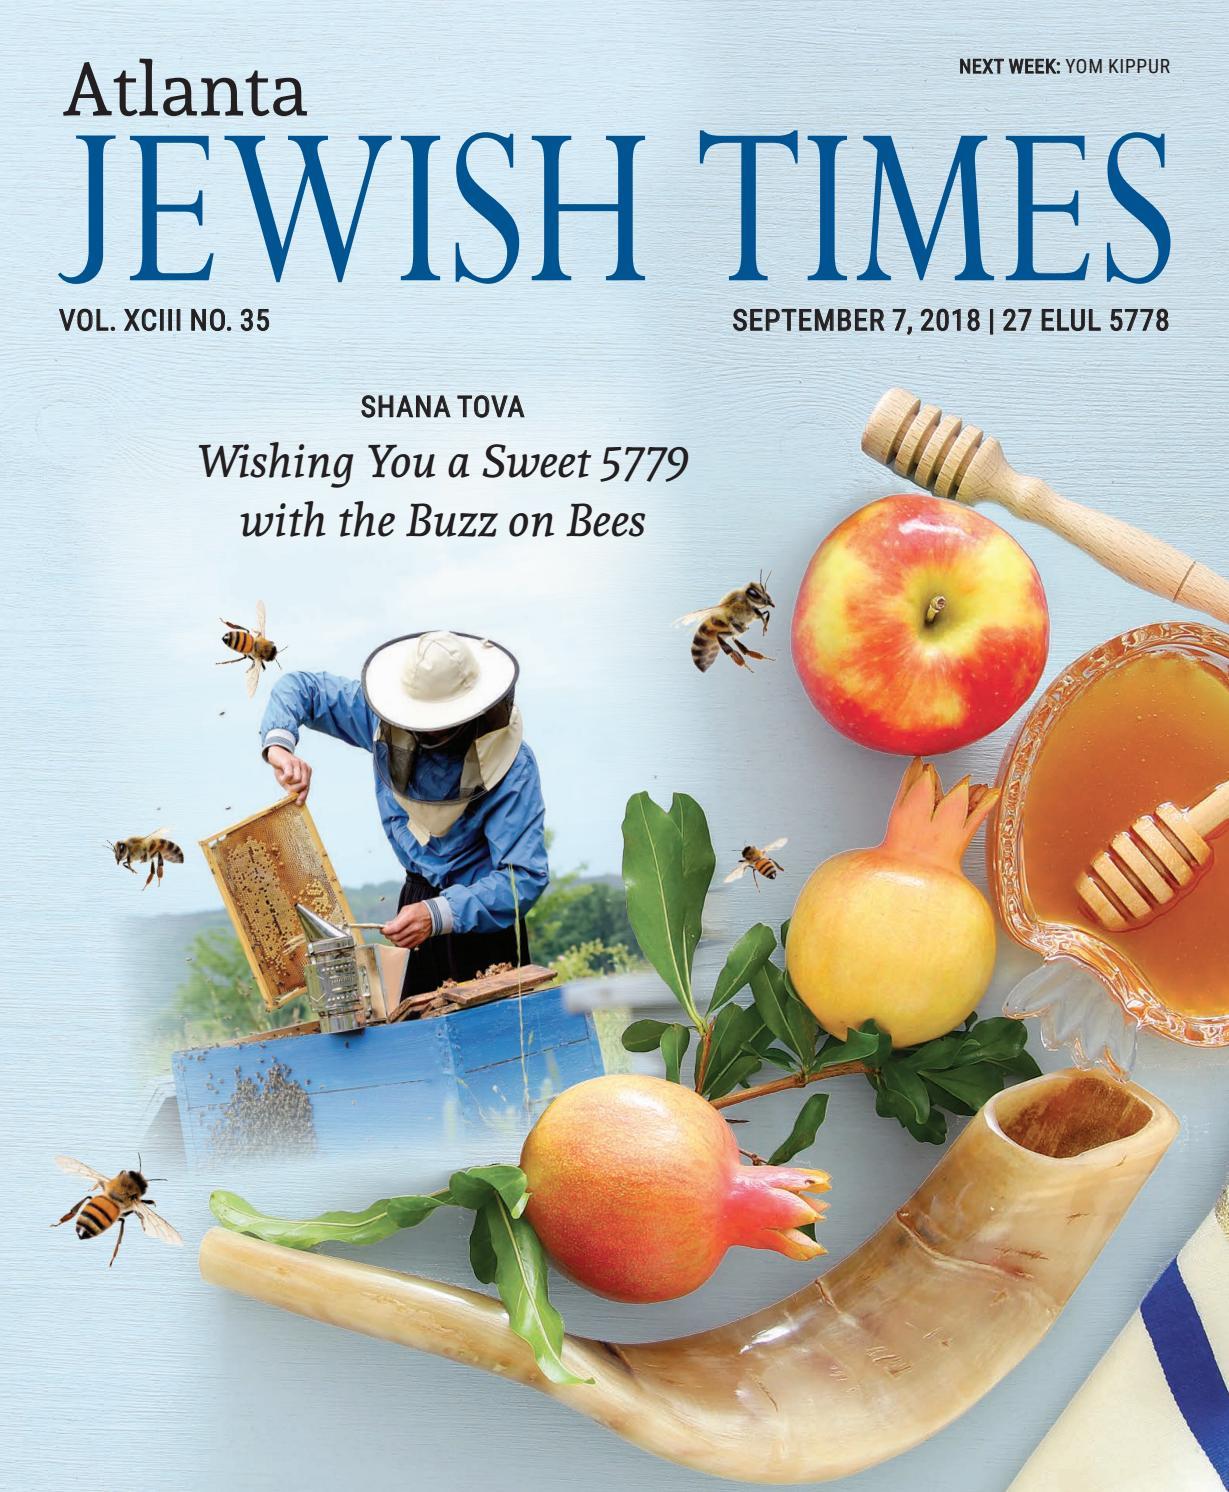 Atlanta Jewish Times Vol Xciii No 35 September 7 2018 By Uha Chocolate Milk Candy 103g Issuu